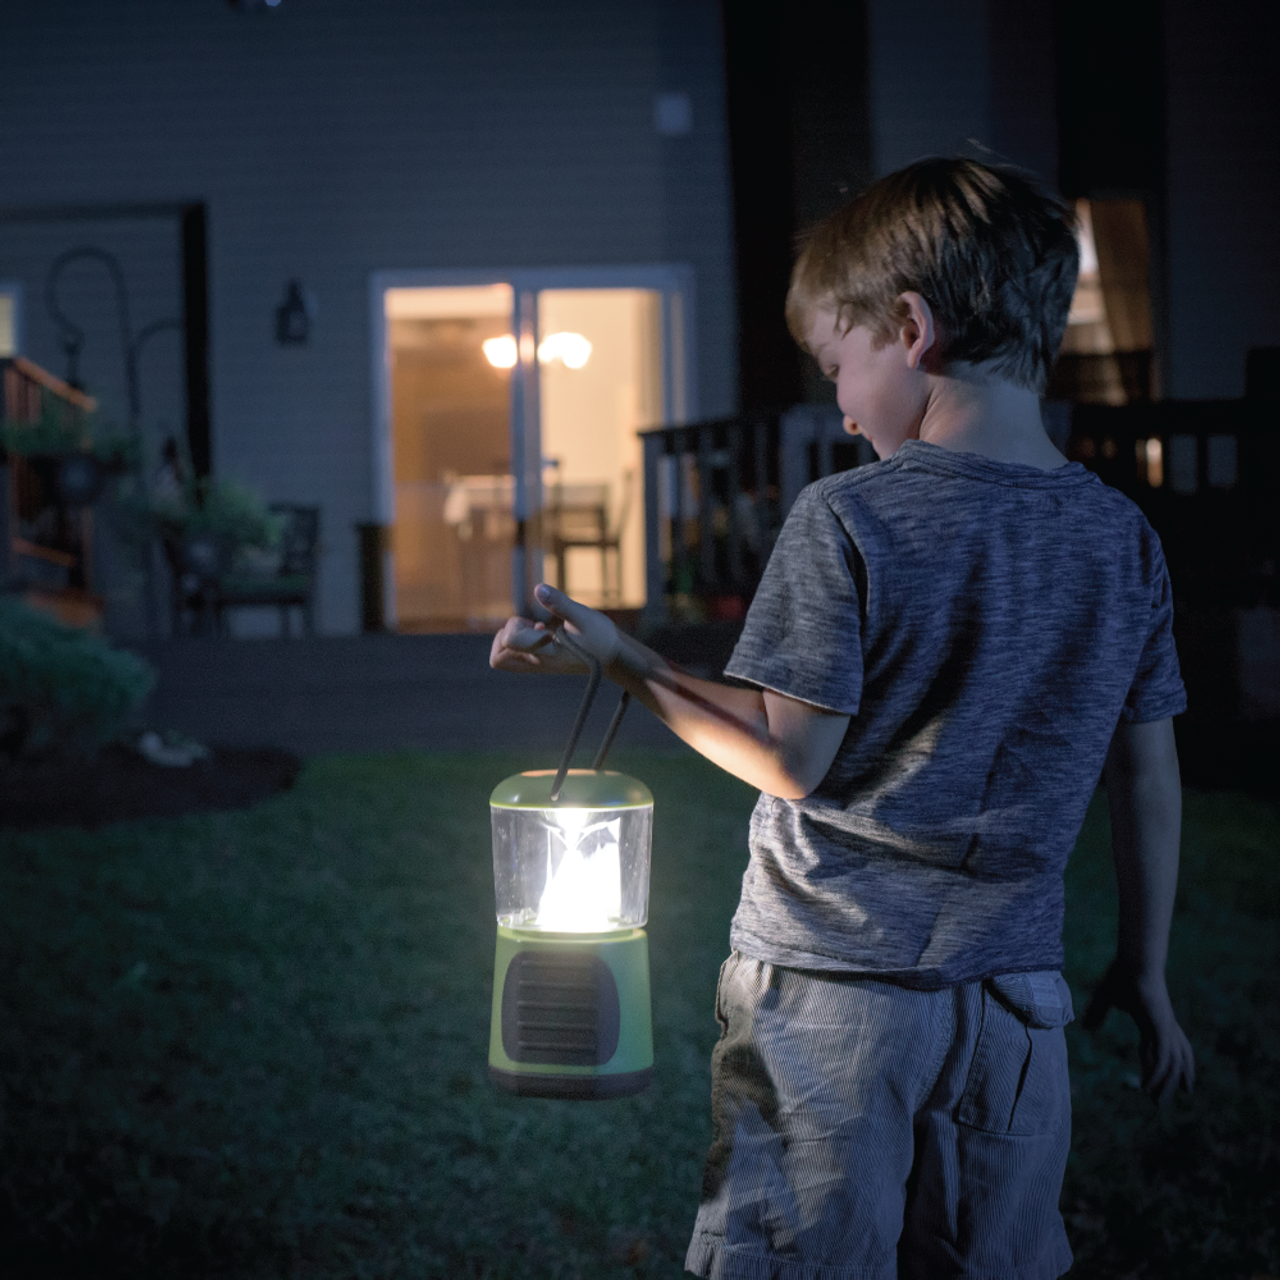 Bright Camping Lantern Light Led With Usb Port